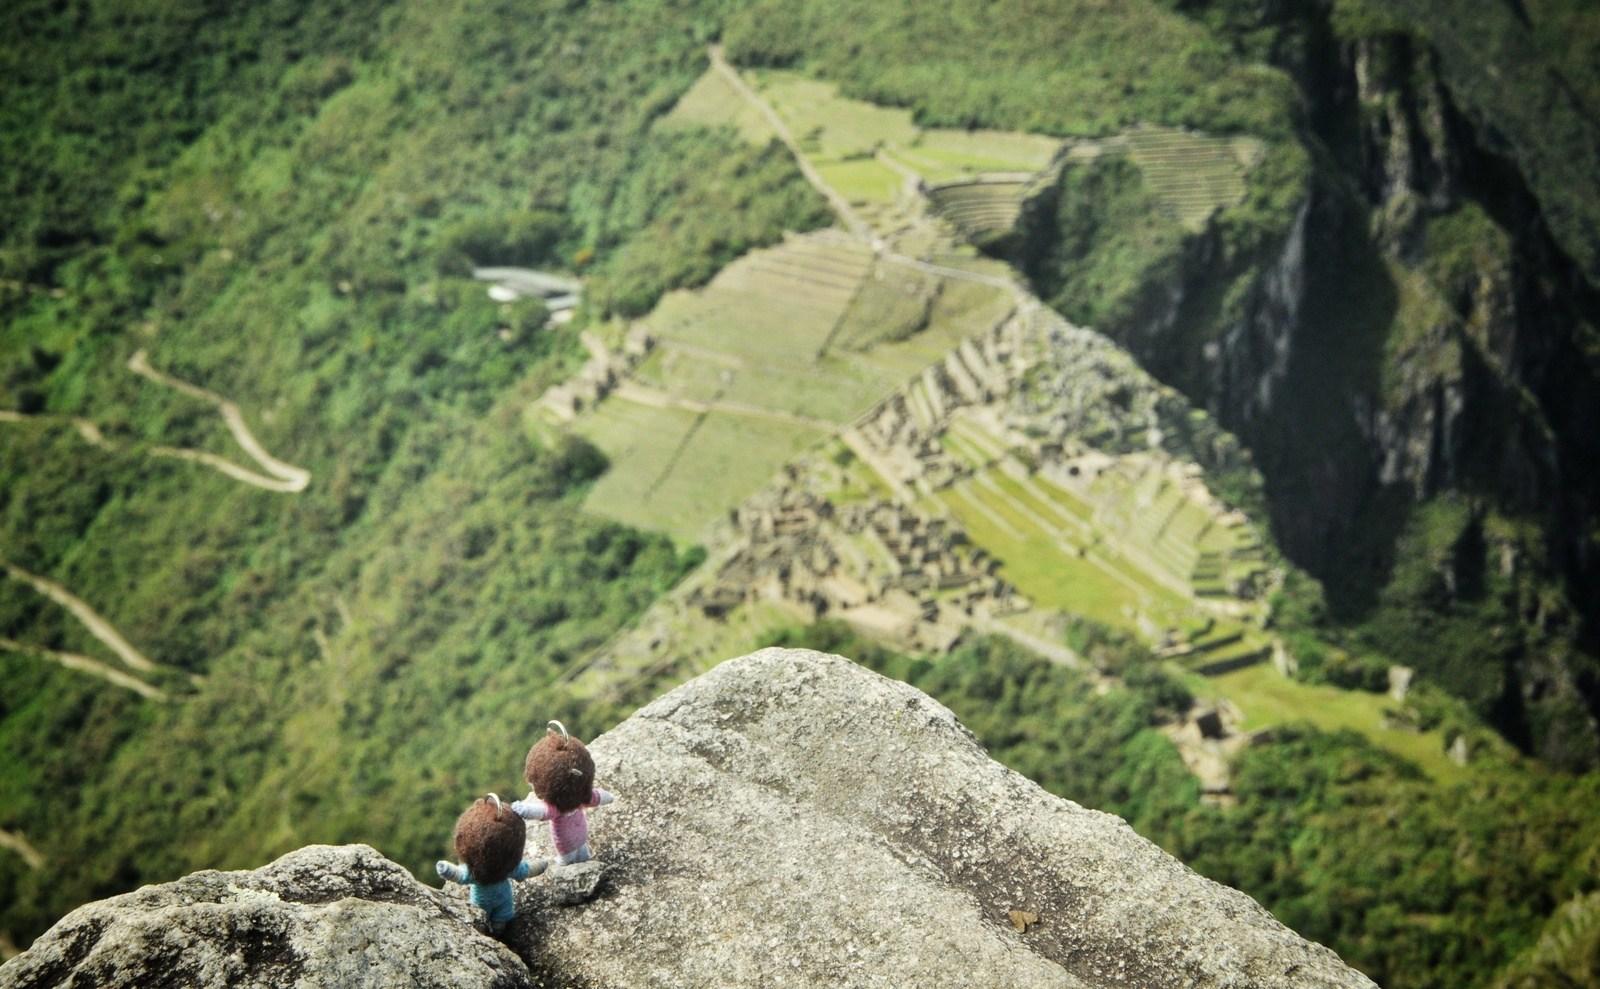 Us, over the inca world Machu Picchu